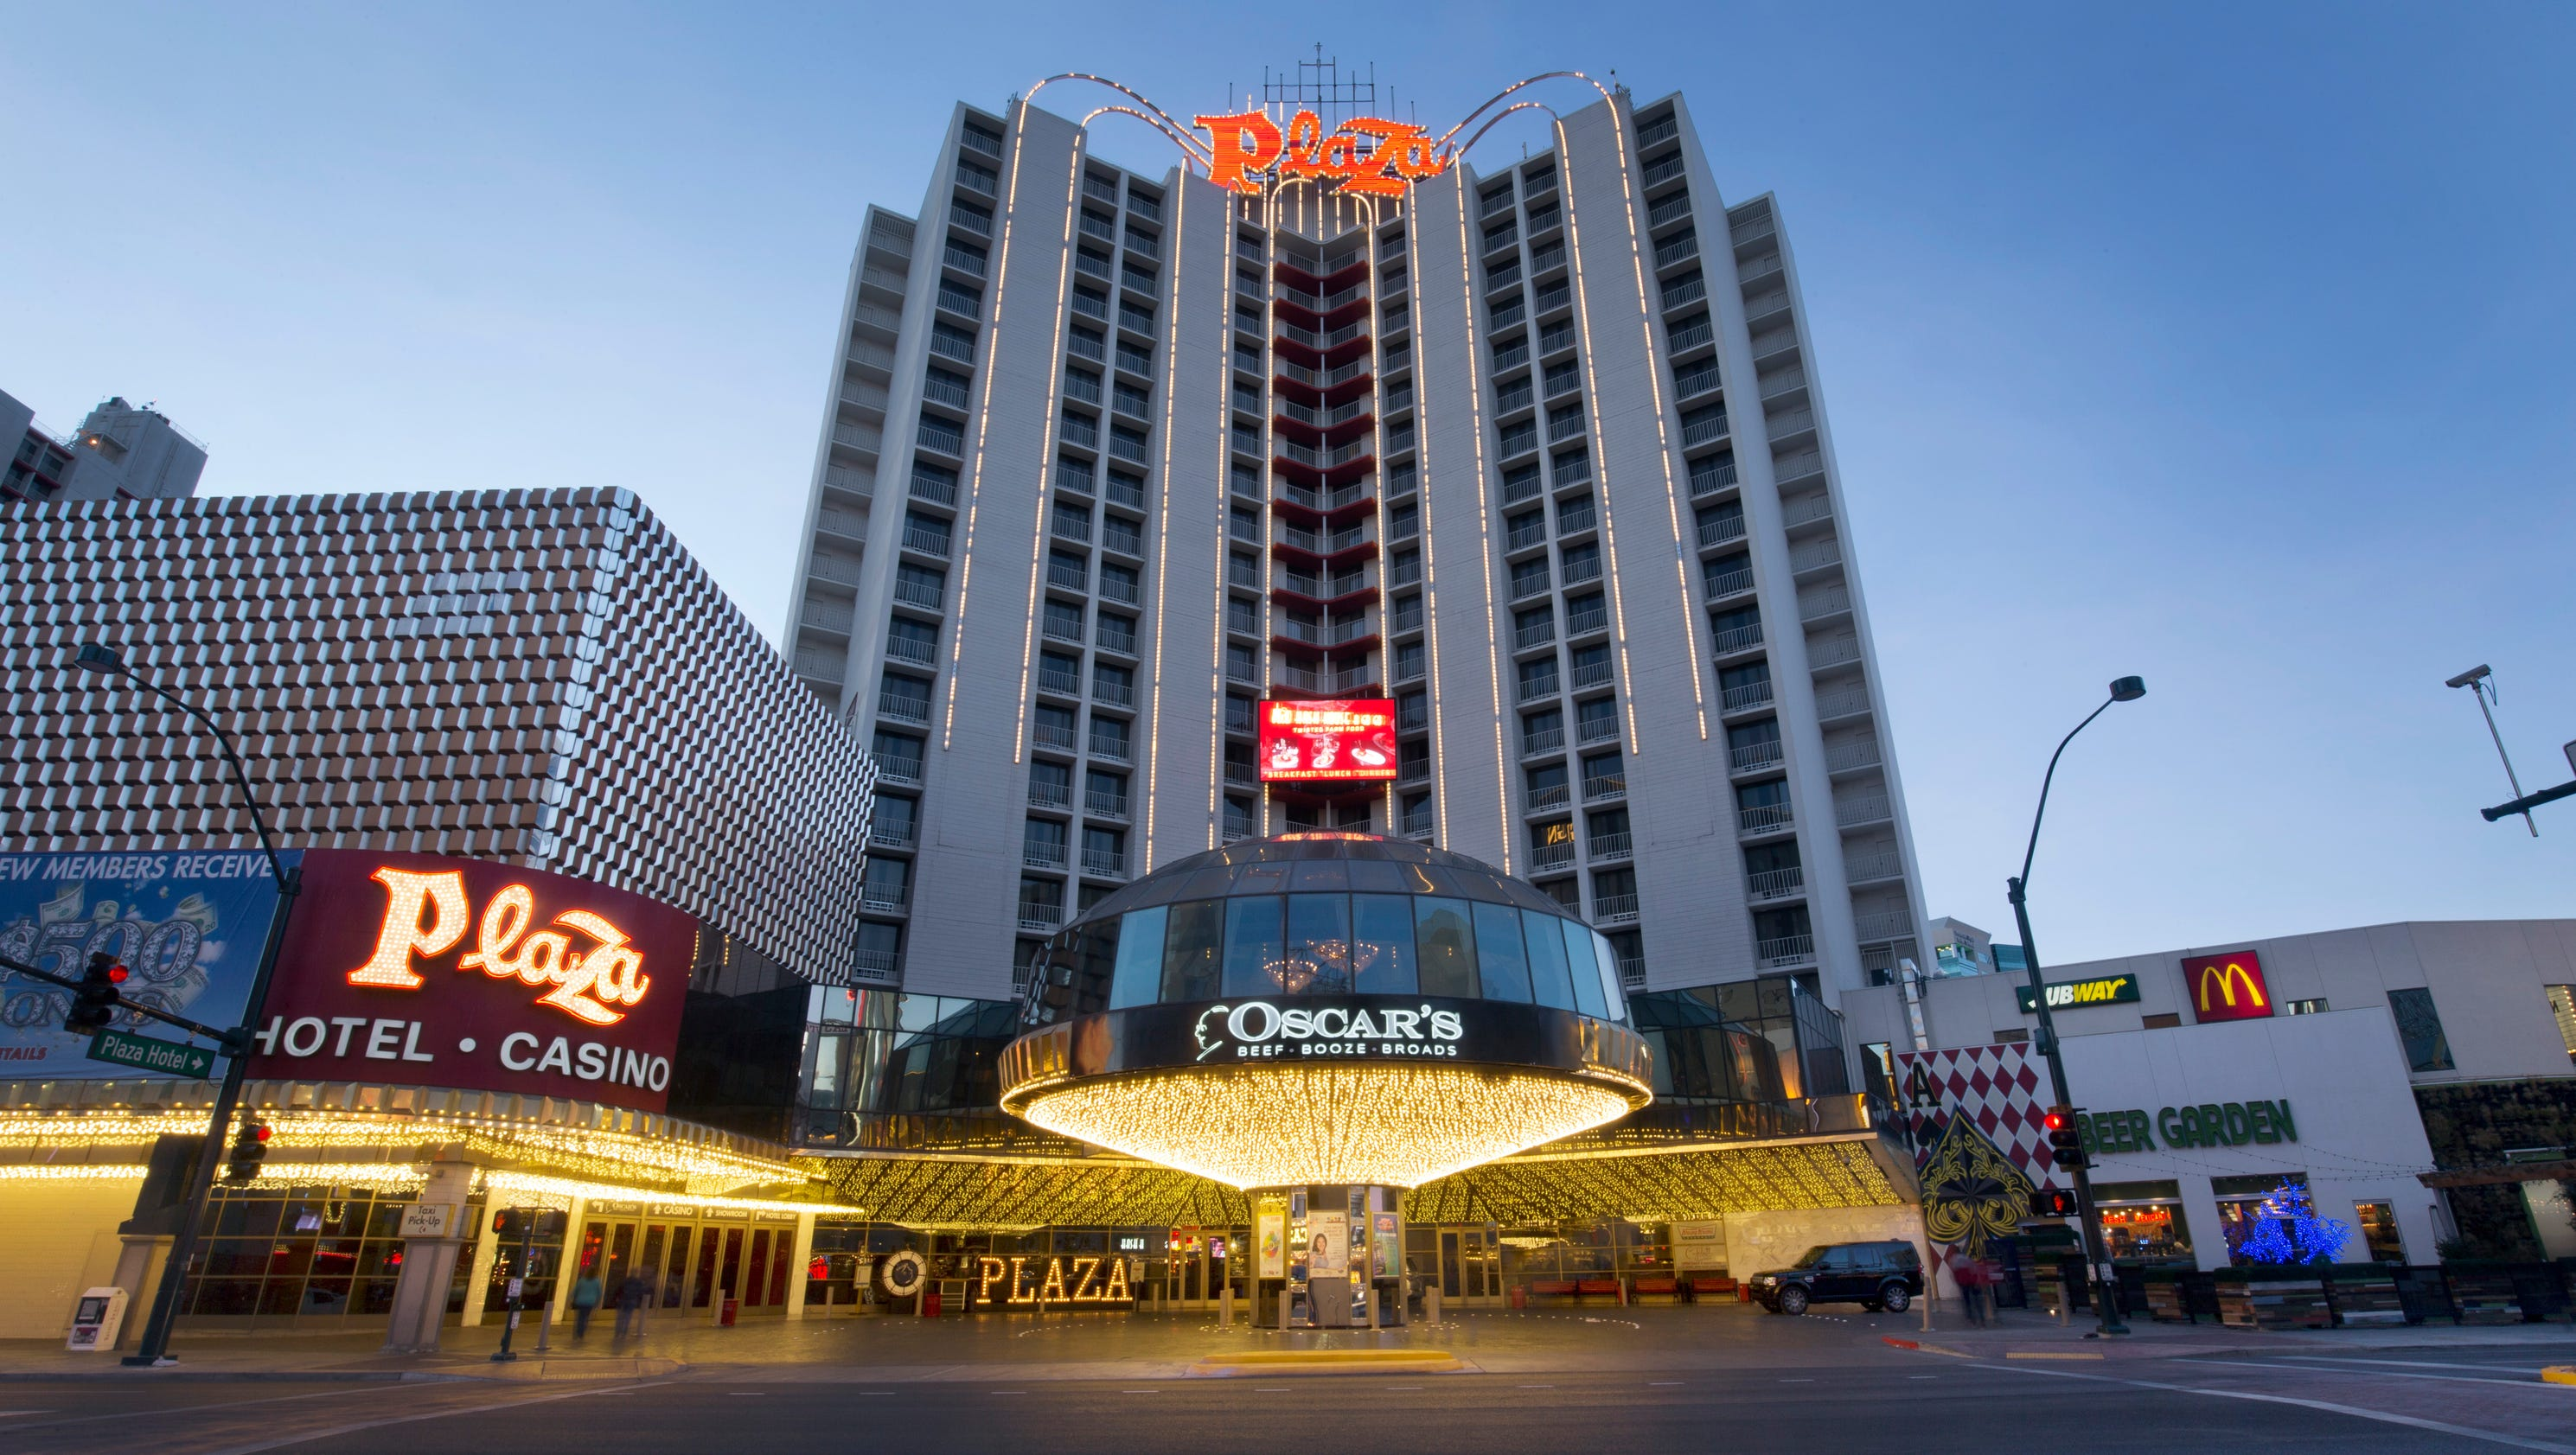 Plaza casino hotel new casino construction